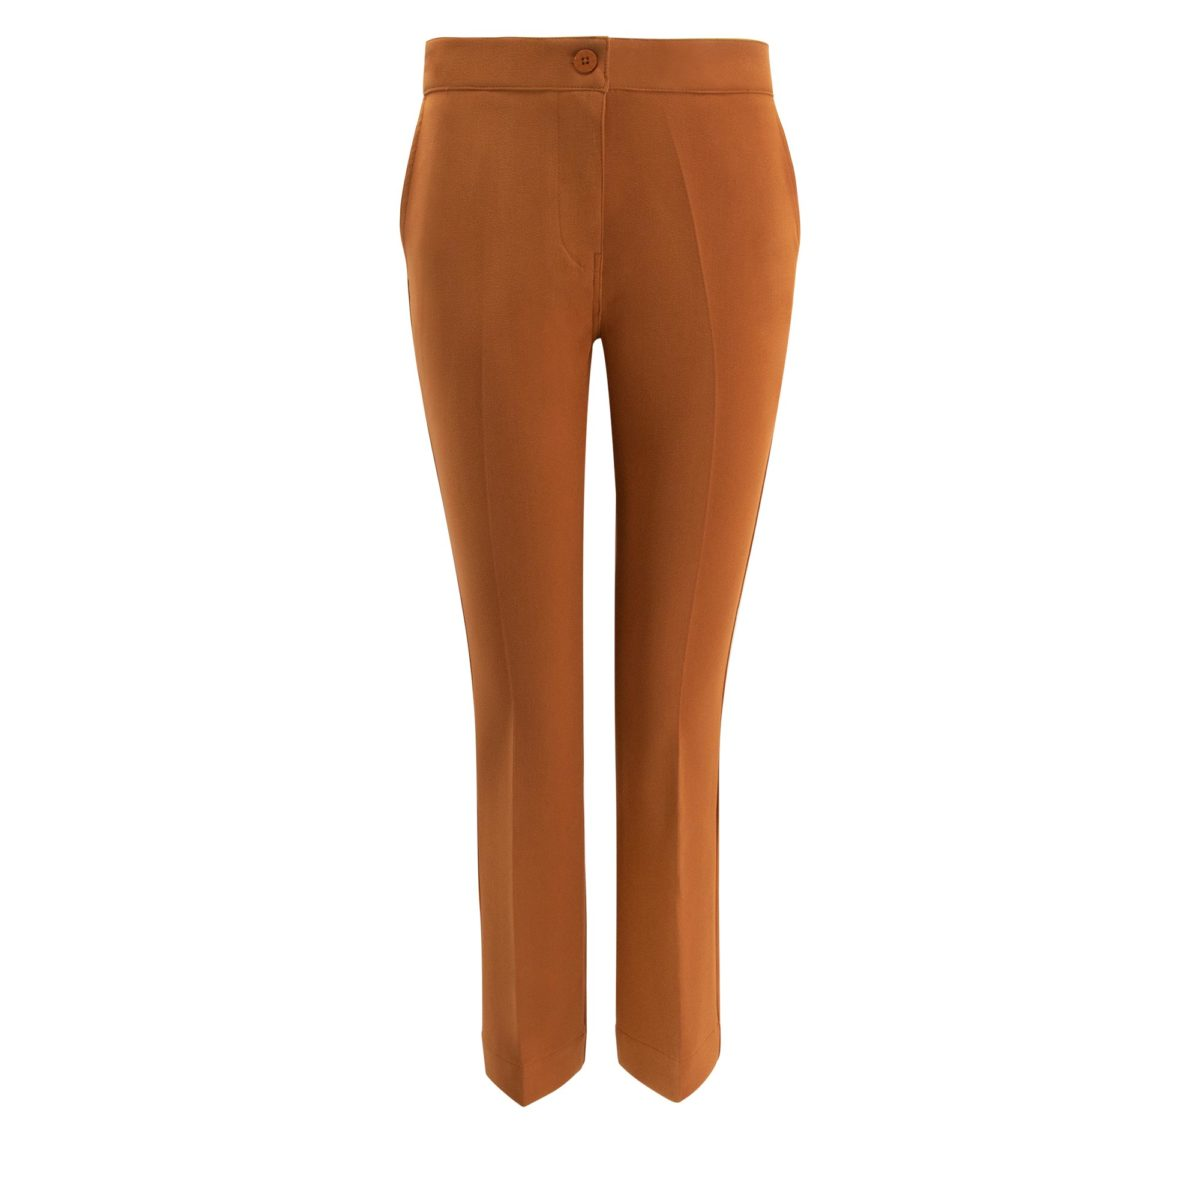 Pantalone Flare Marrone - vista frontale | Nicla